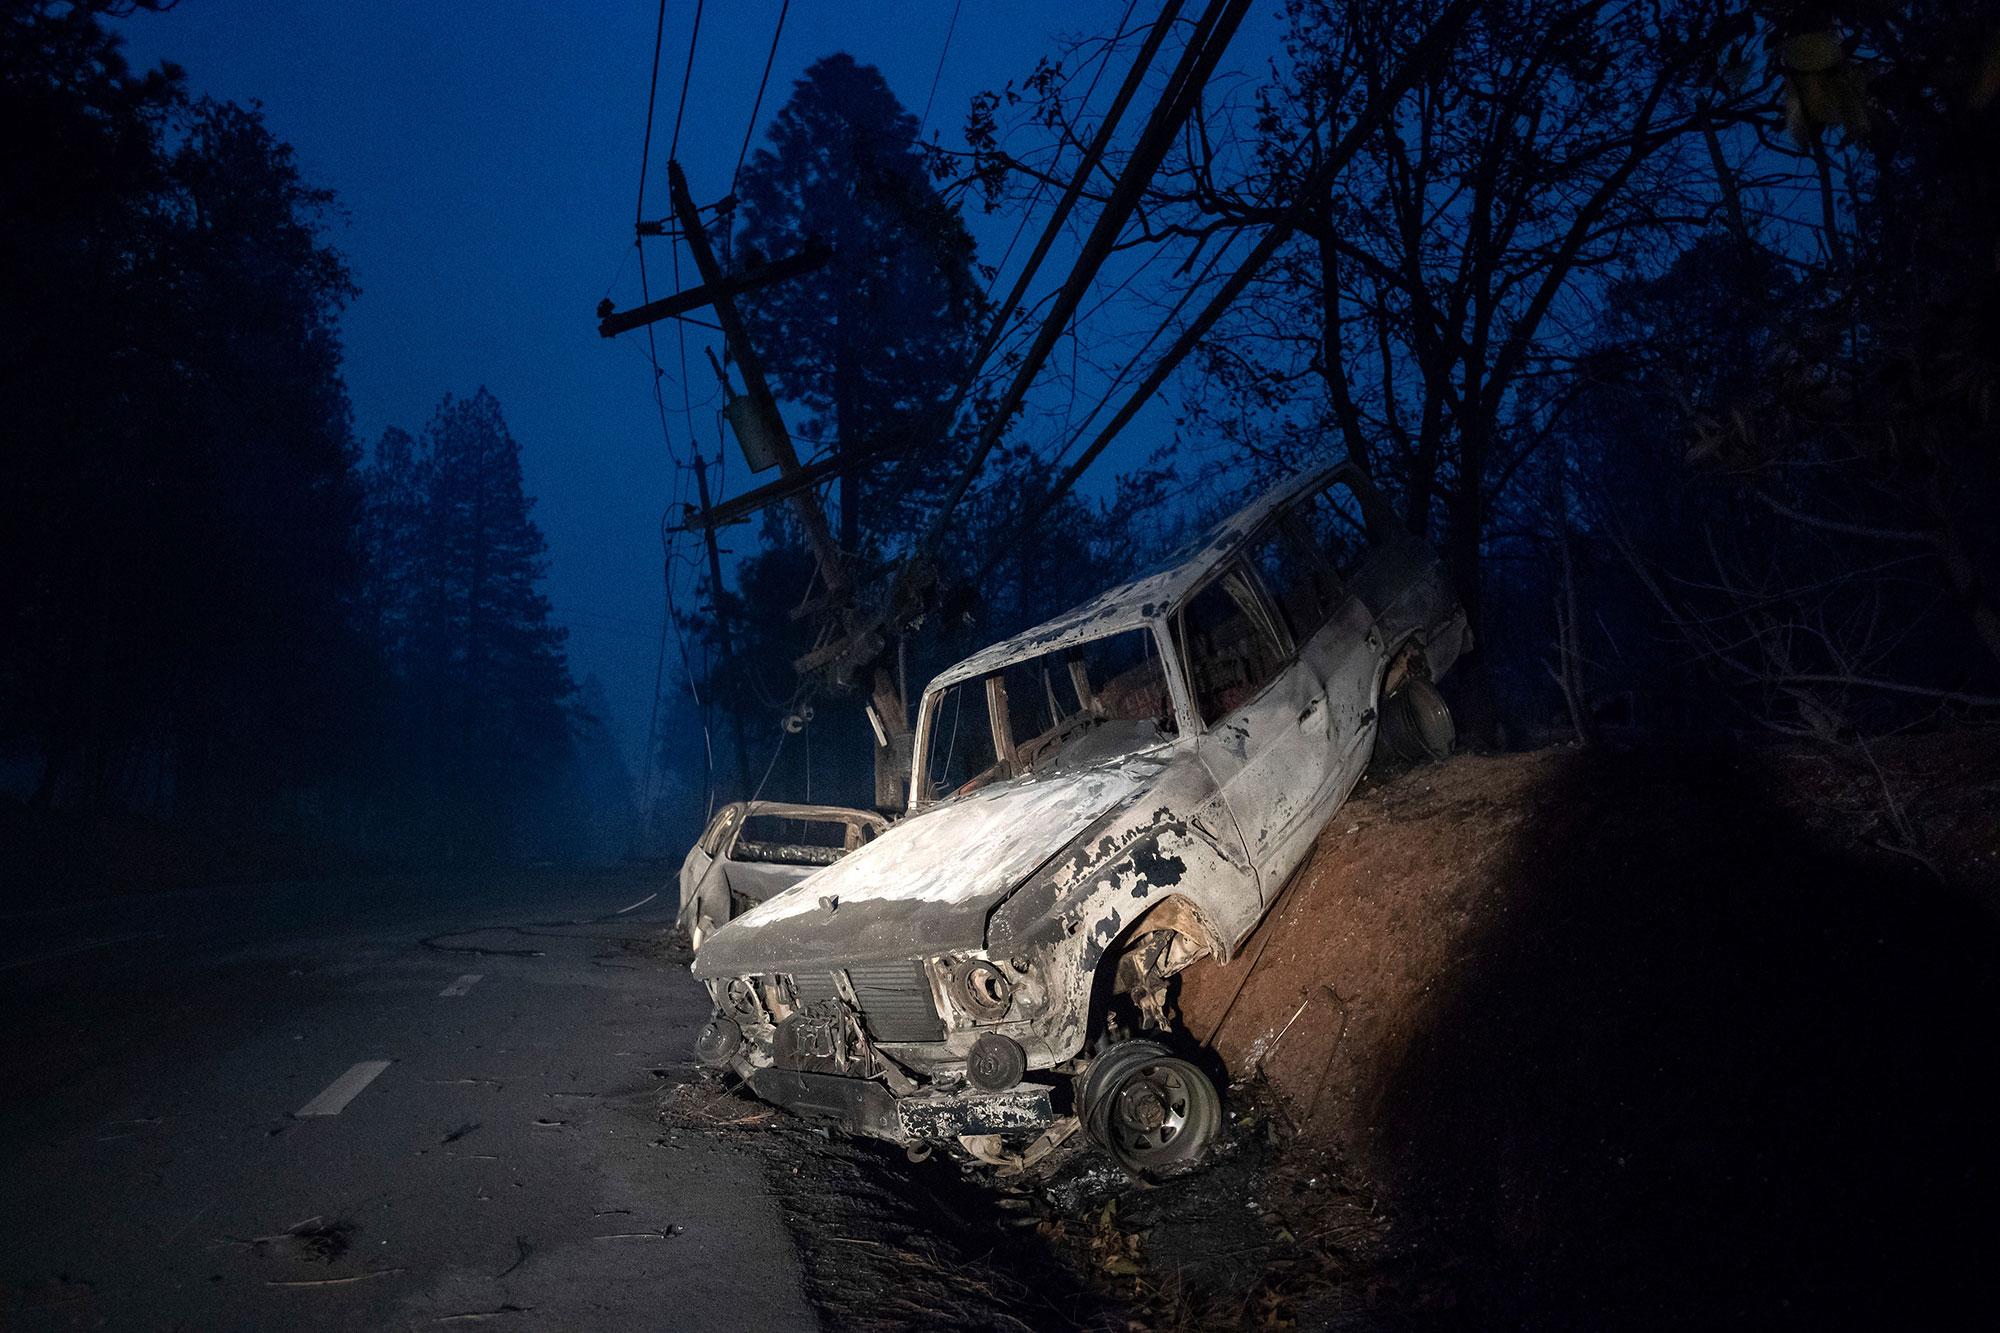 <div class='meta'><div class='origin-logo' data-origin='none'></div><span class='caption-text' data-credit='Noah Berger/AP Photo'>A scorched vehicle rests on a roadside as the Camp Fire tears through Paradise, Calif., on Thursday, Nov. 8, 2018.</span></div>